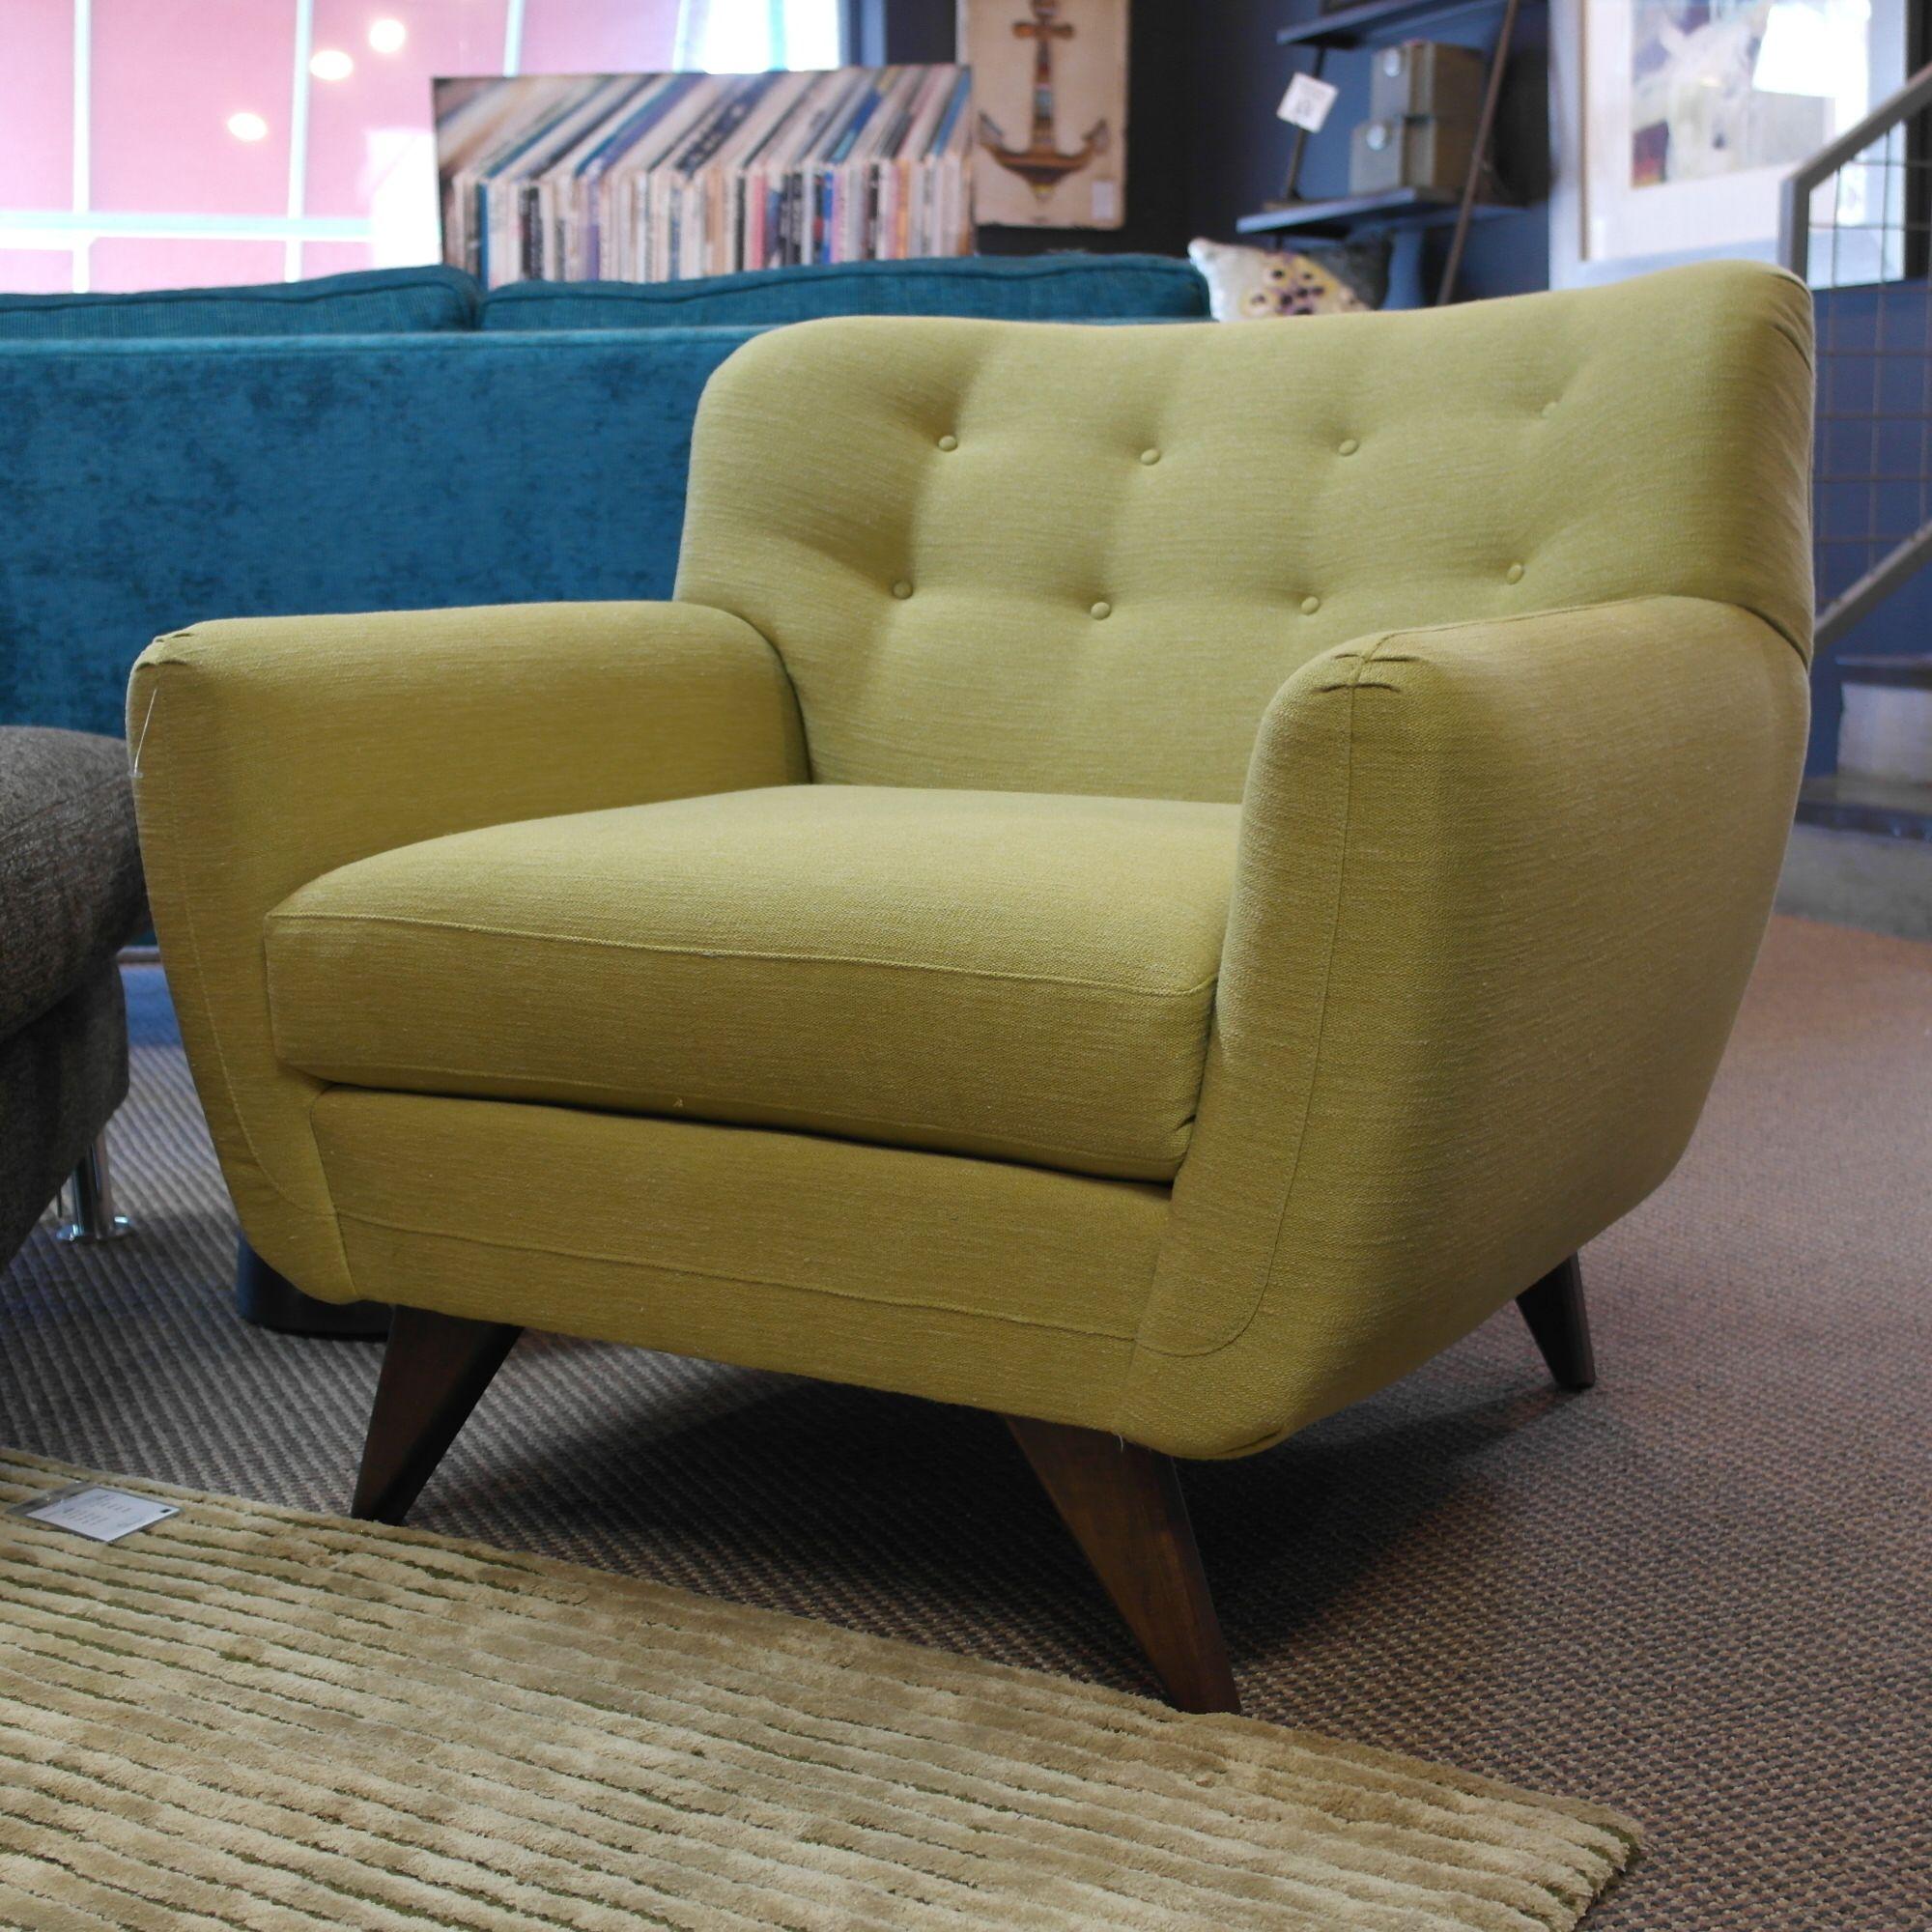 Charming Norwalk Furniture Marie Chair Www.norwalkfurniture.com